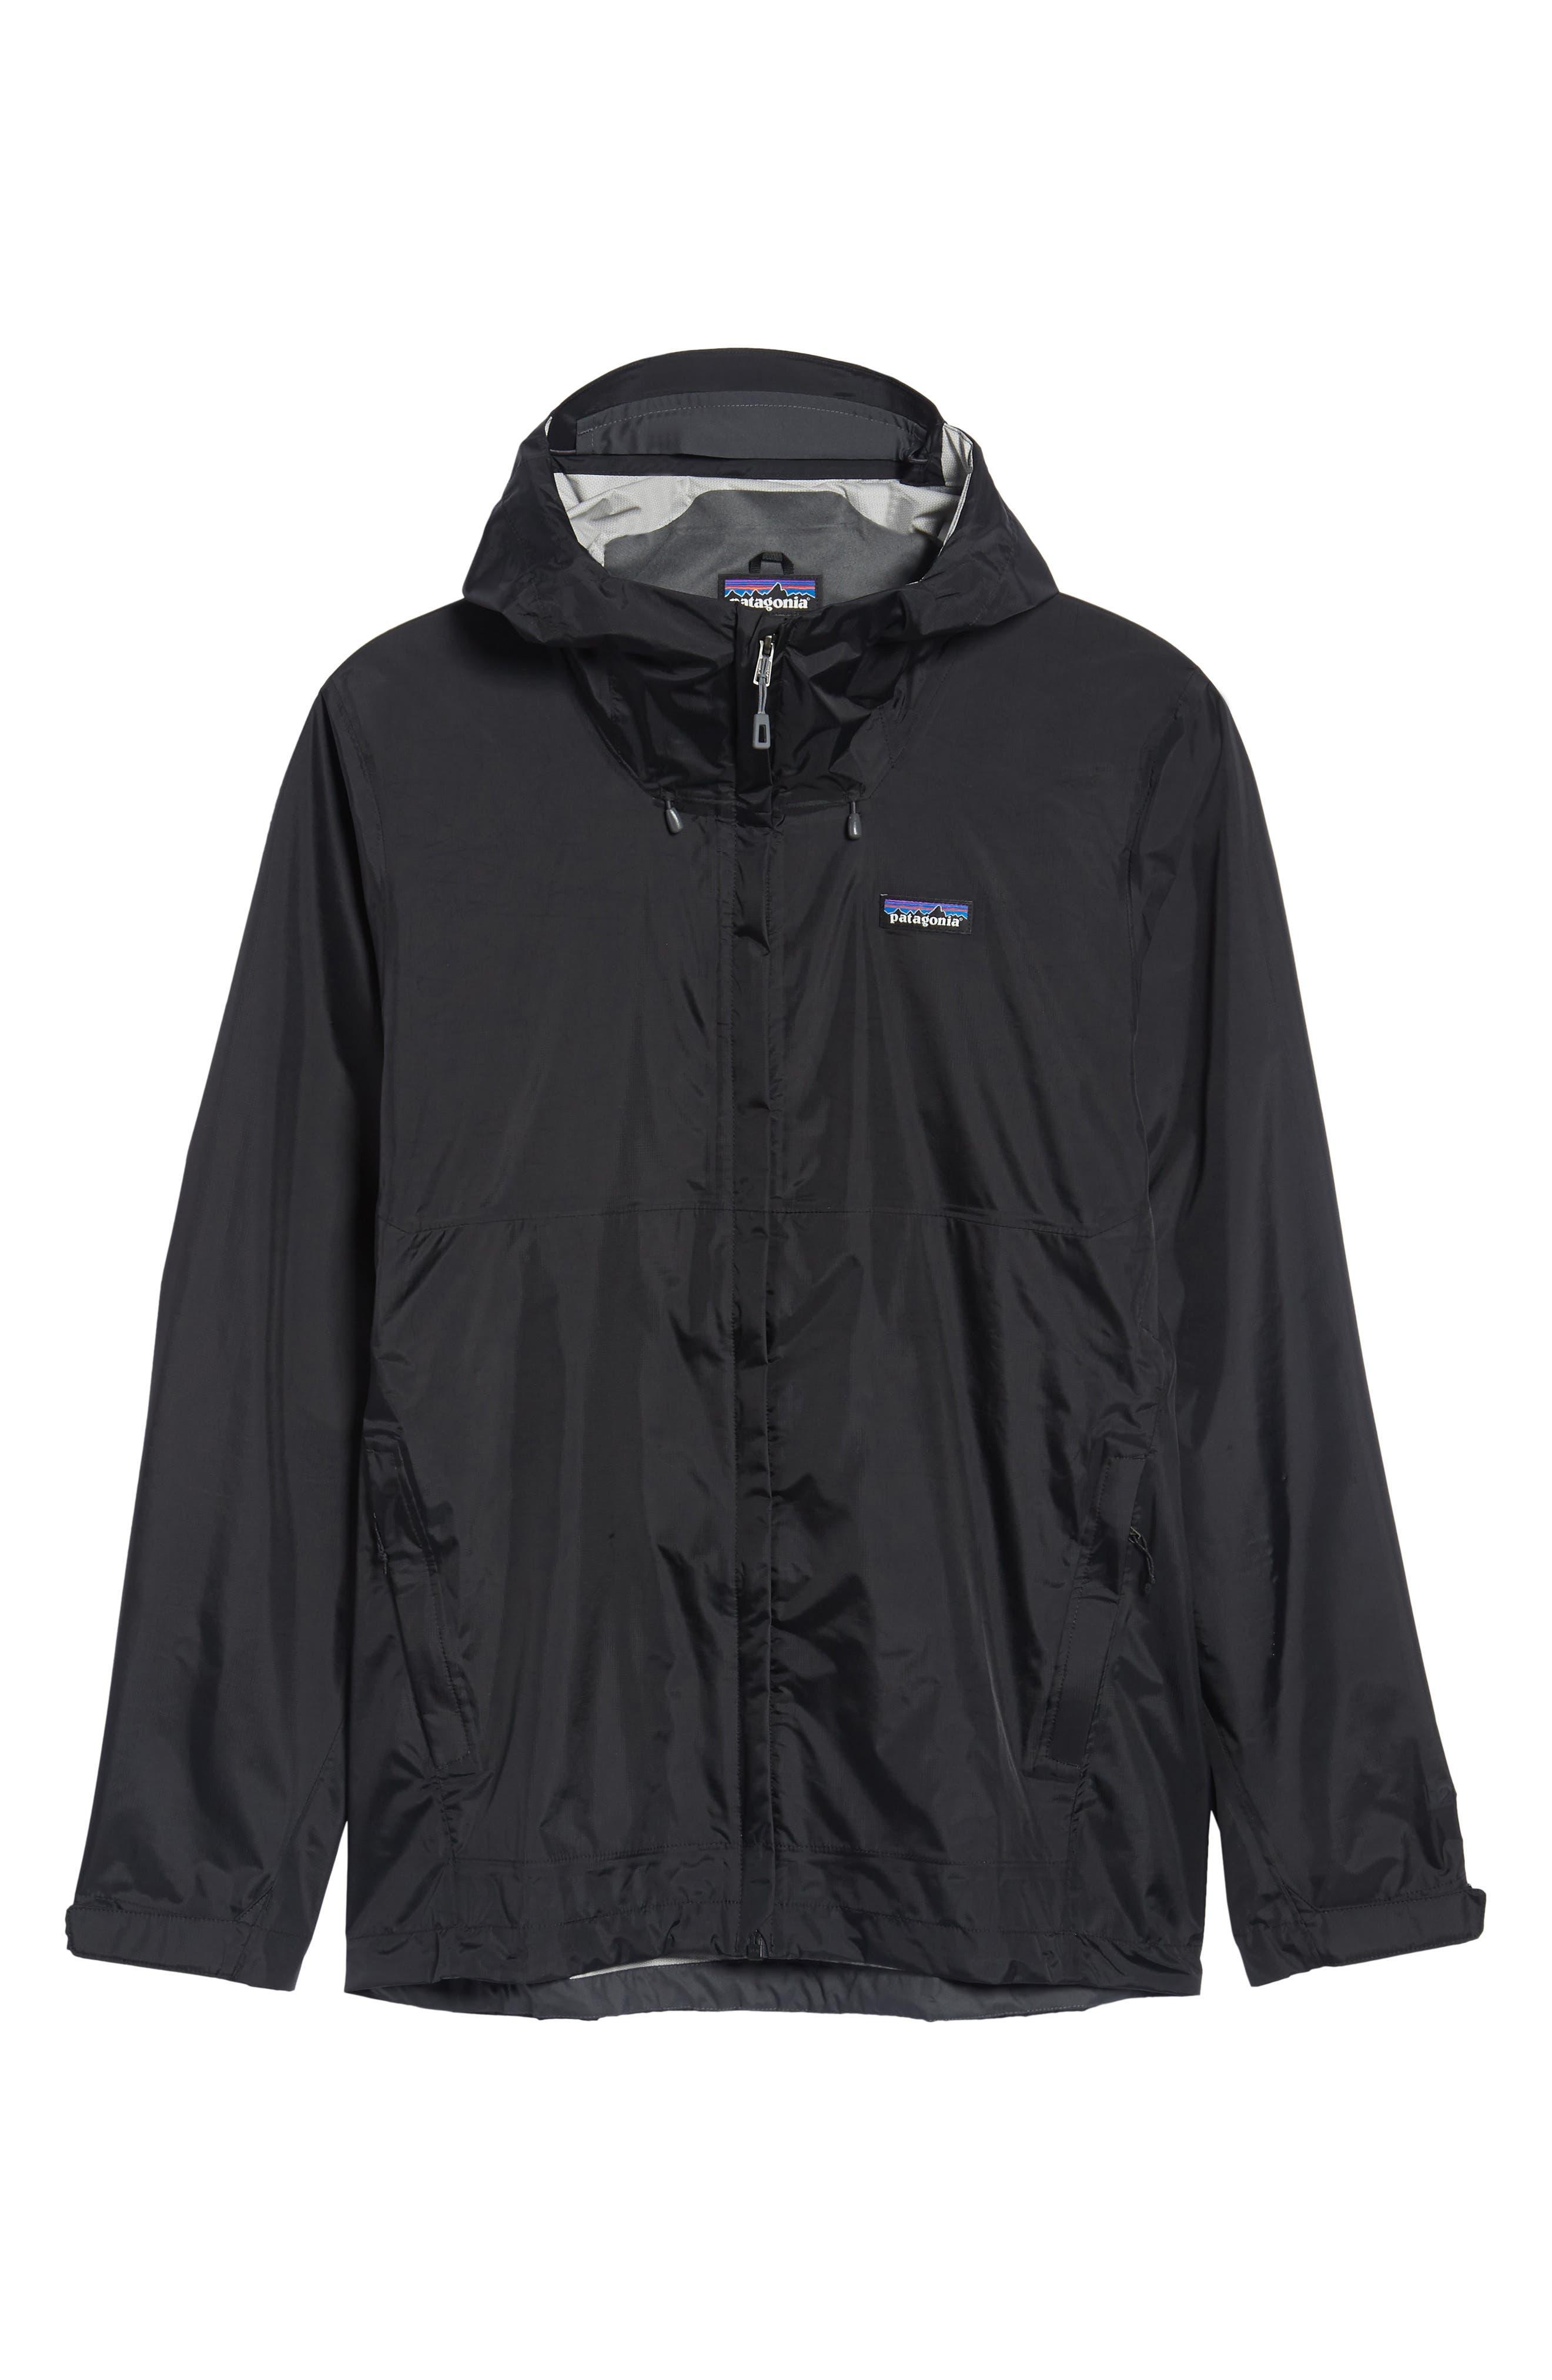 'Torrentshell' Packable Rain Jacket,                         Main,                         color, Black